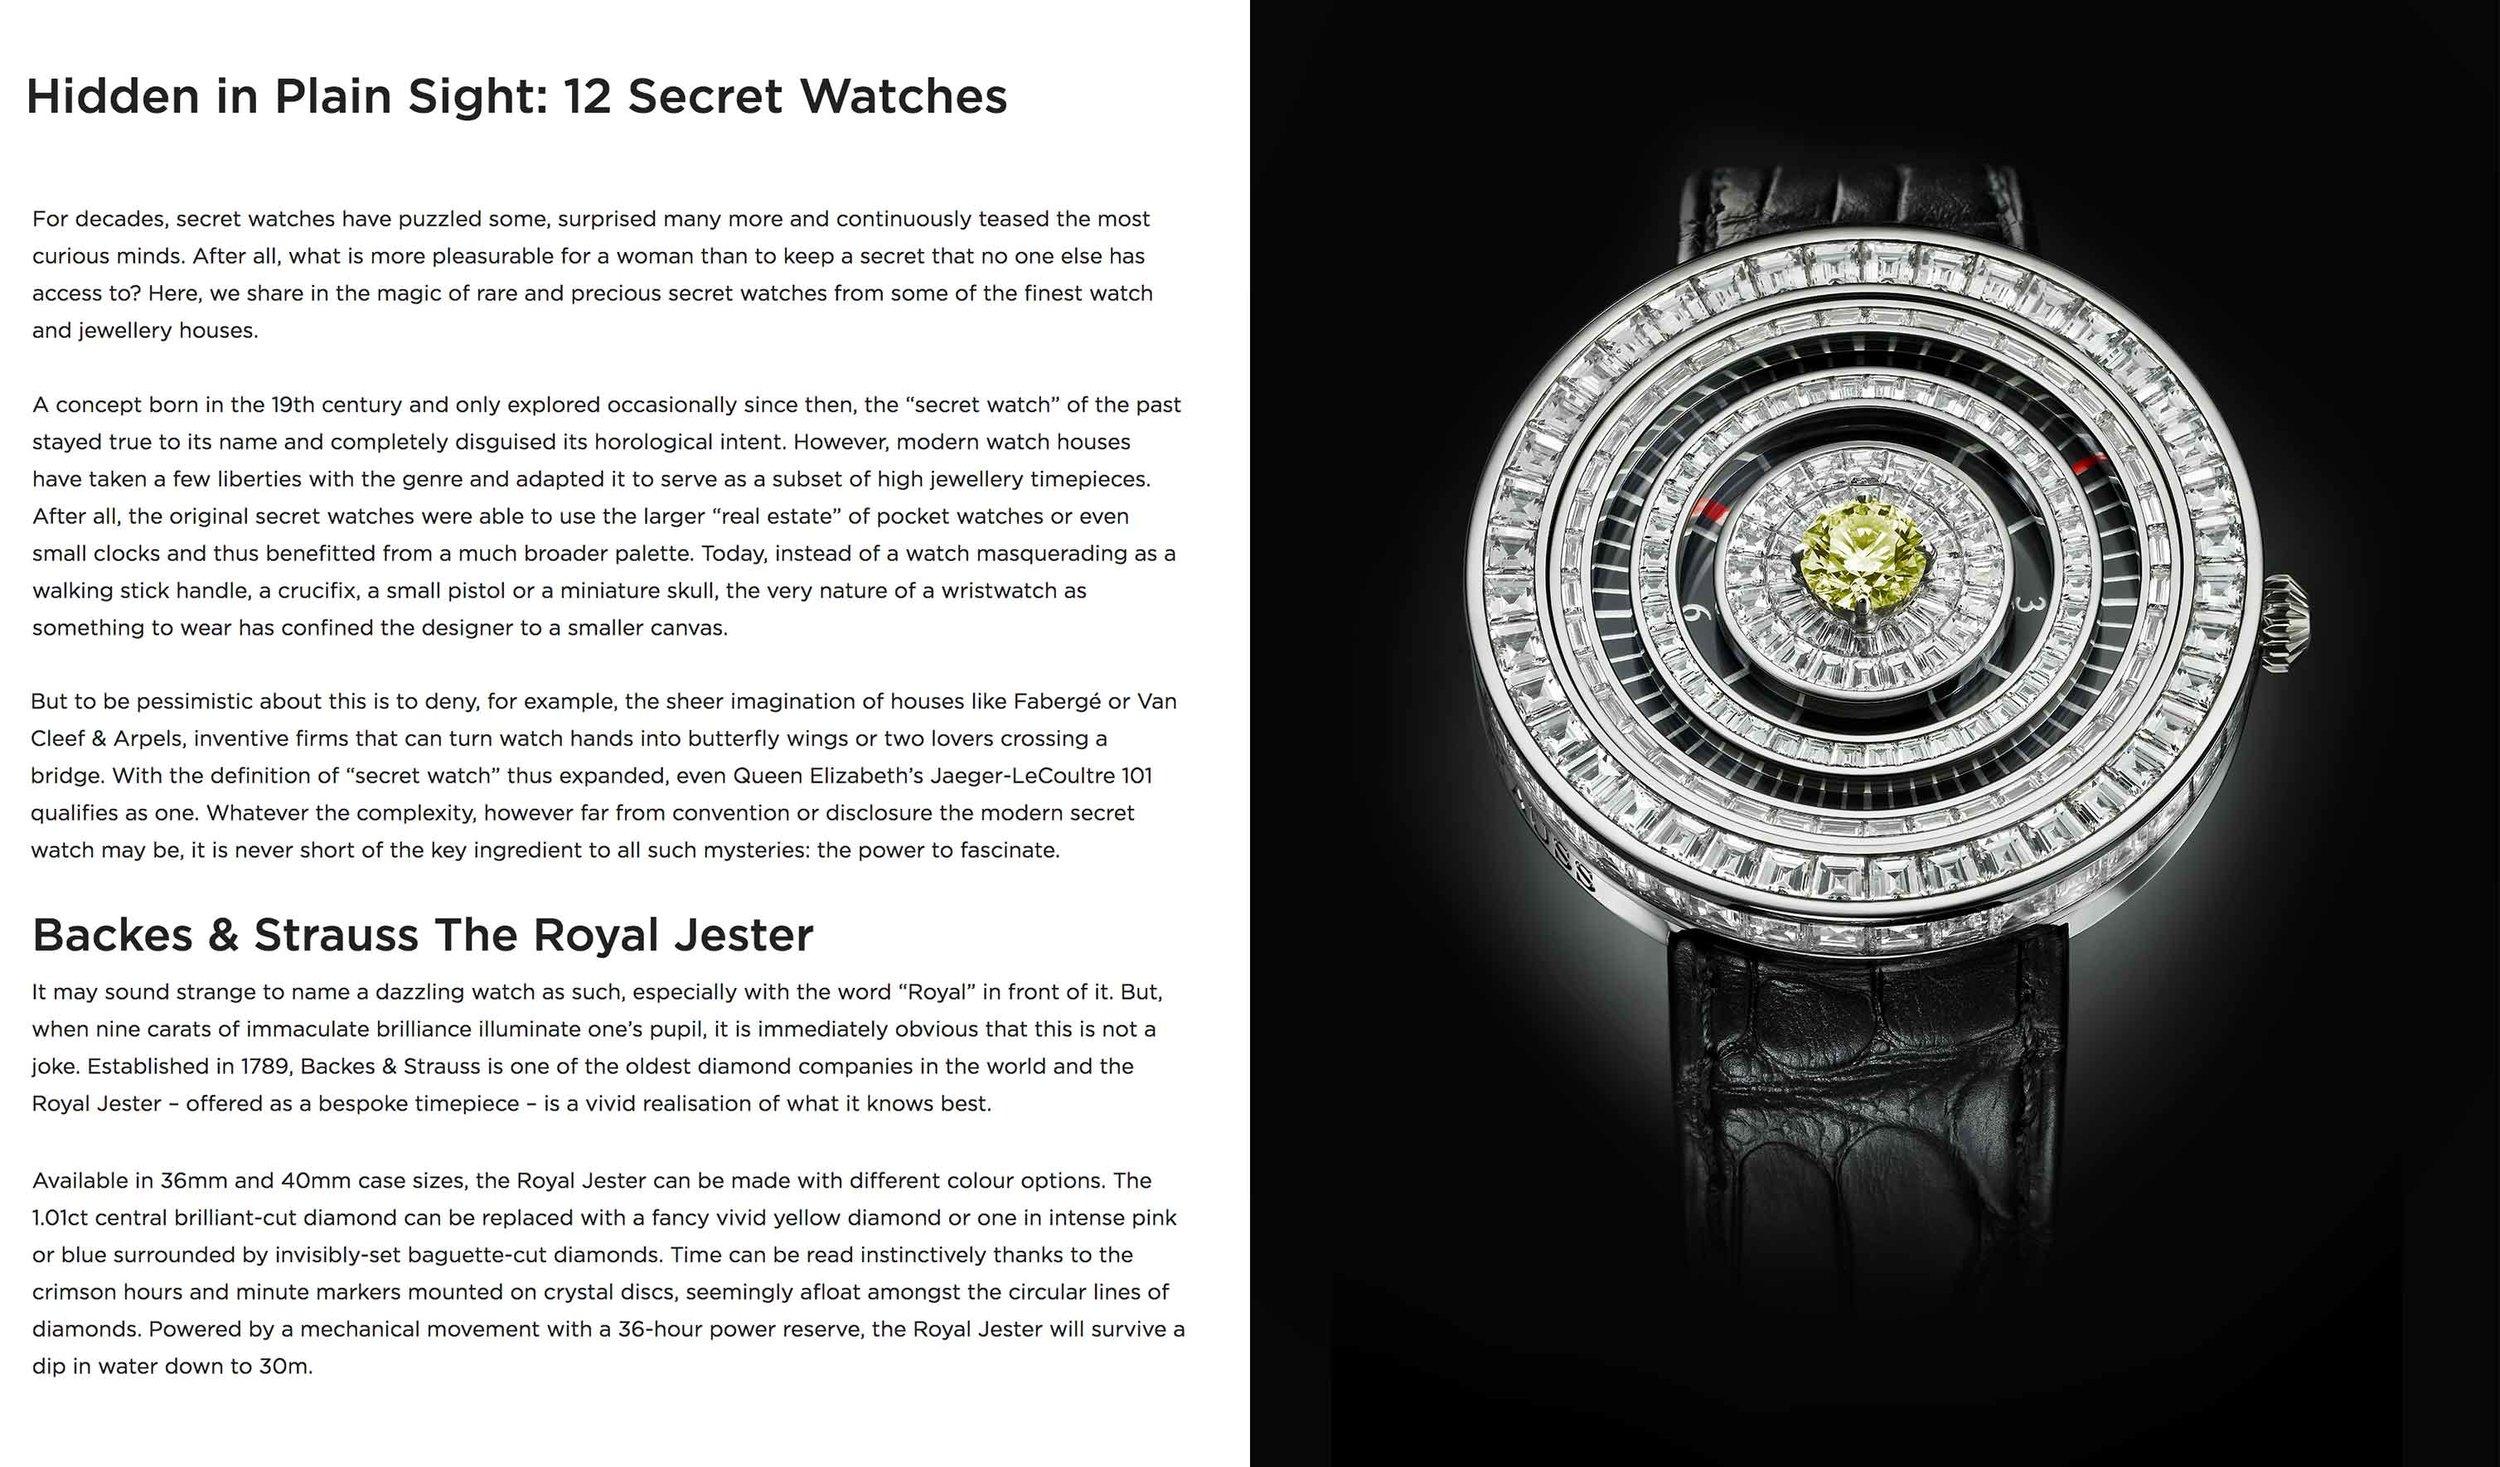 Backes & Strauss Royal Jester diamond encrusted watch